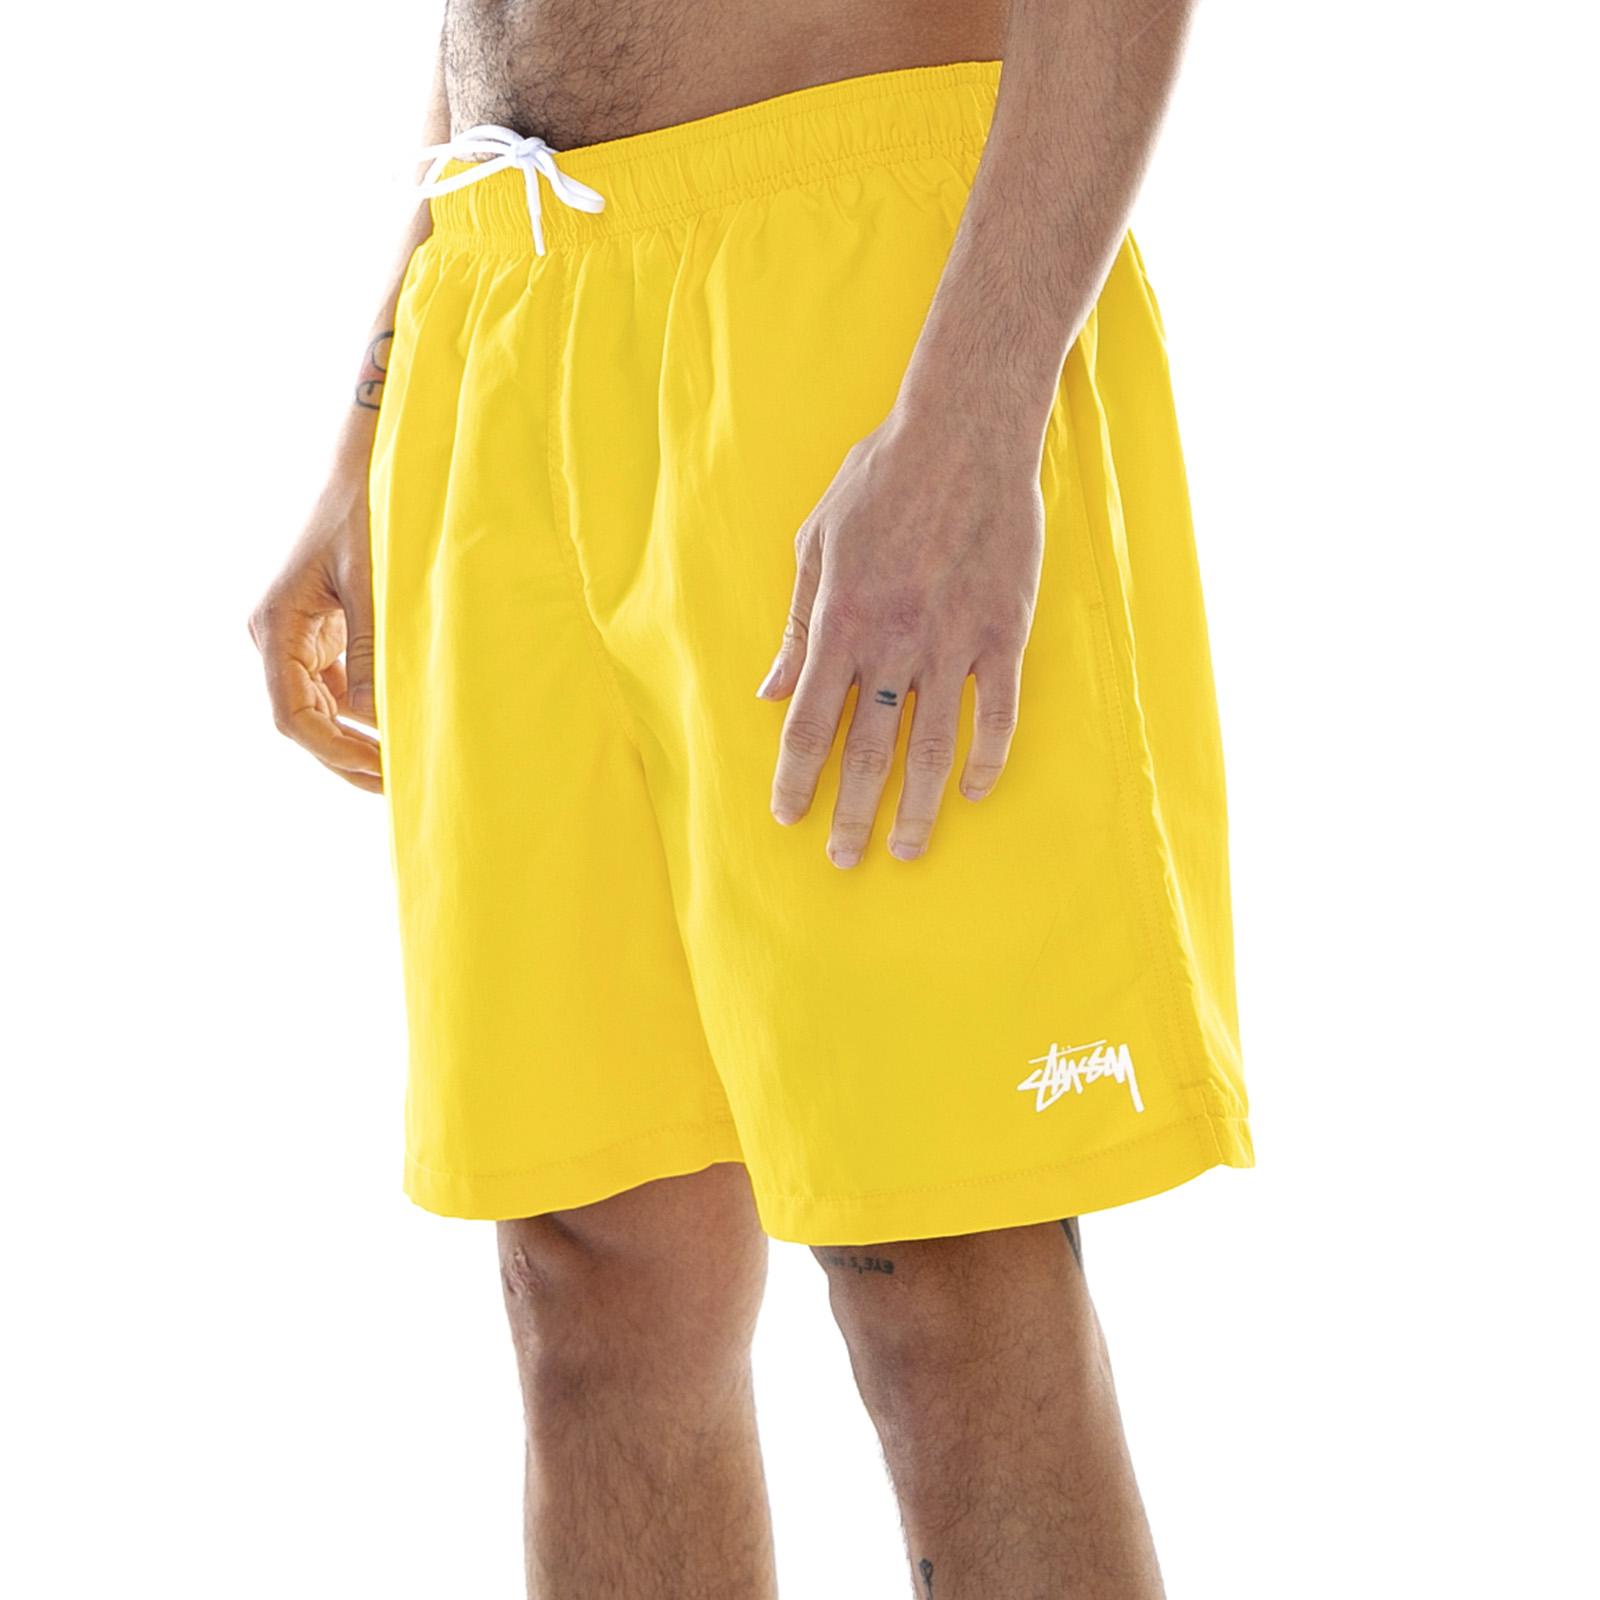 14af96f9c088 Stussy Stock Water Shorts - Yellow - Costume Da Bagno Uomo Giallo | eBay